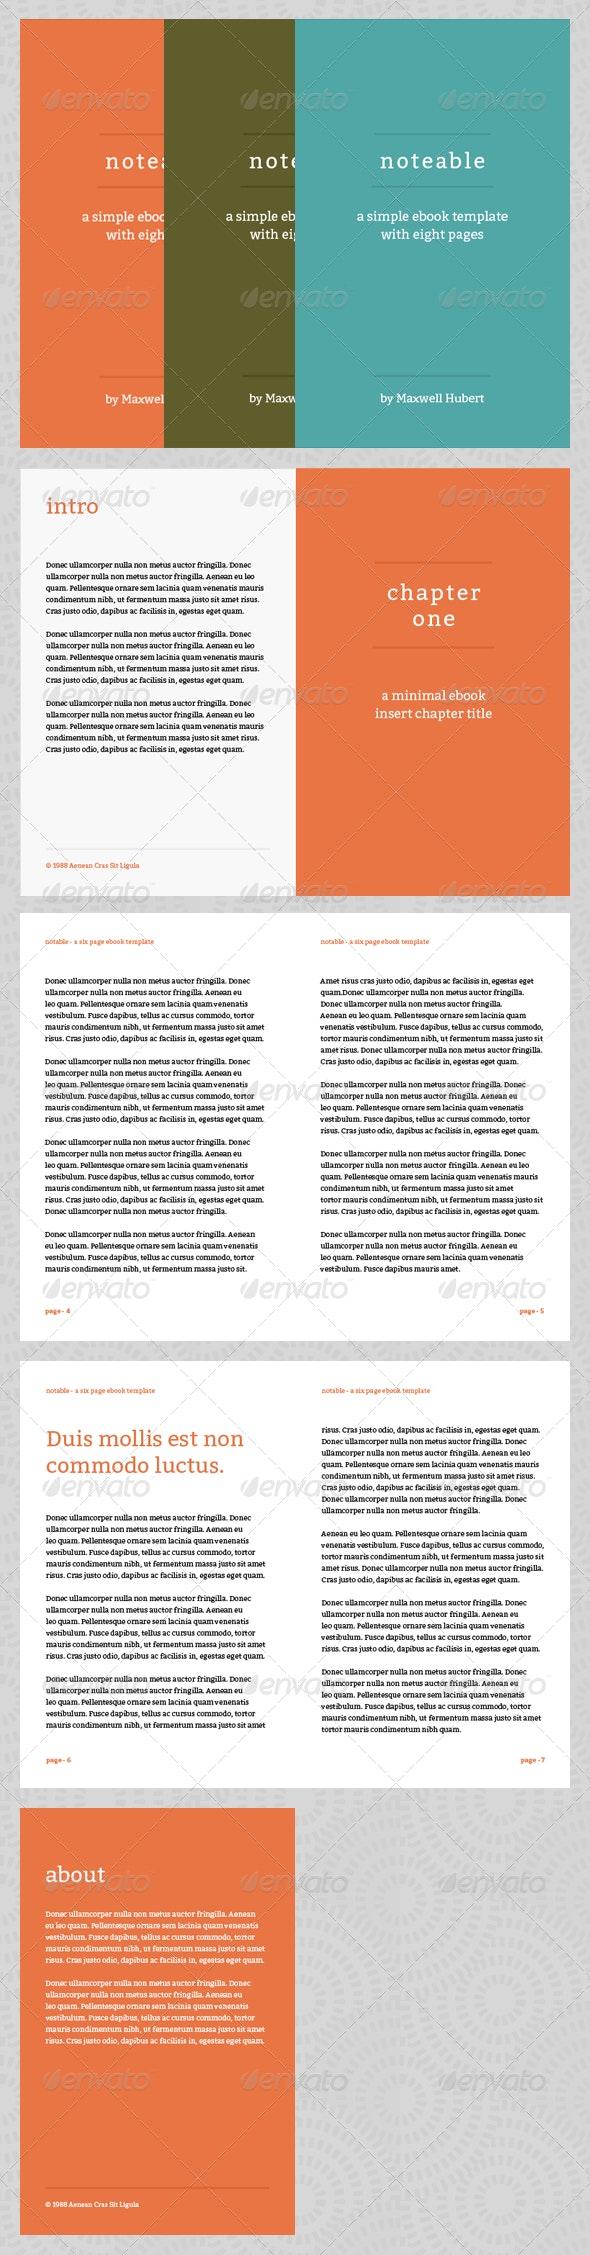 Notable - eBook Template or Print Book - Miscellaneous Print Templates